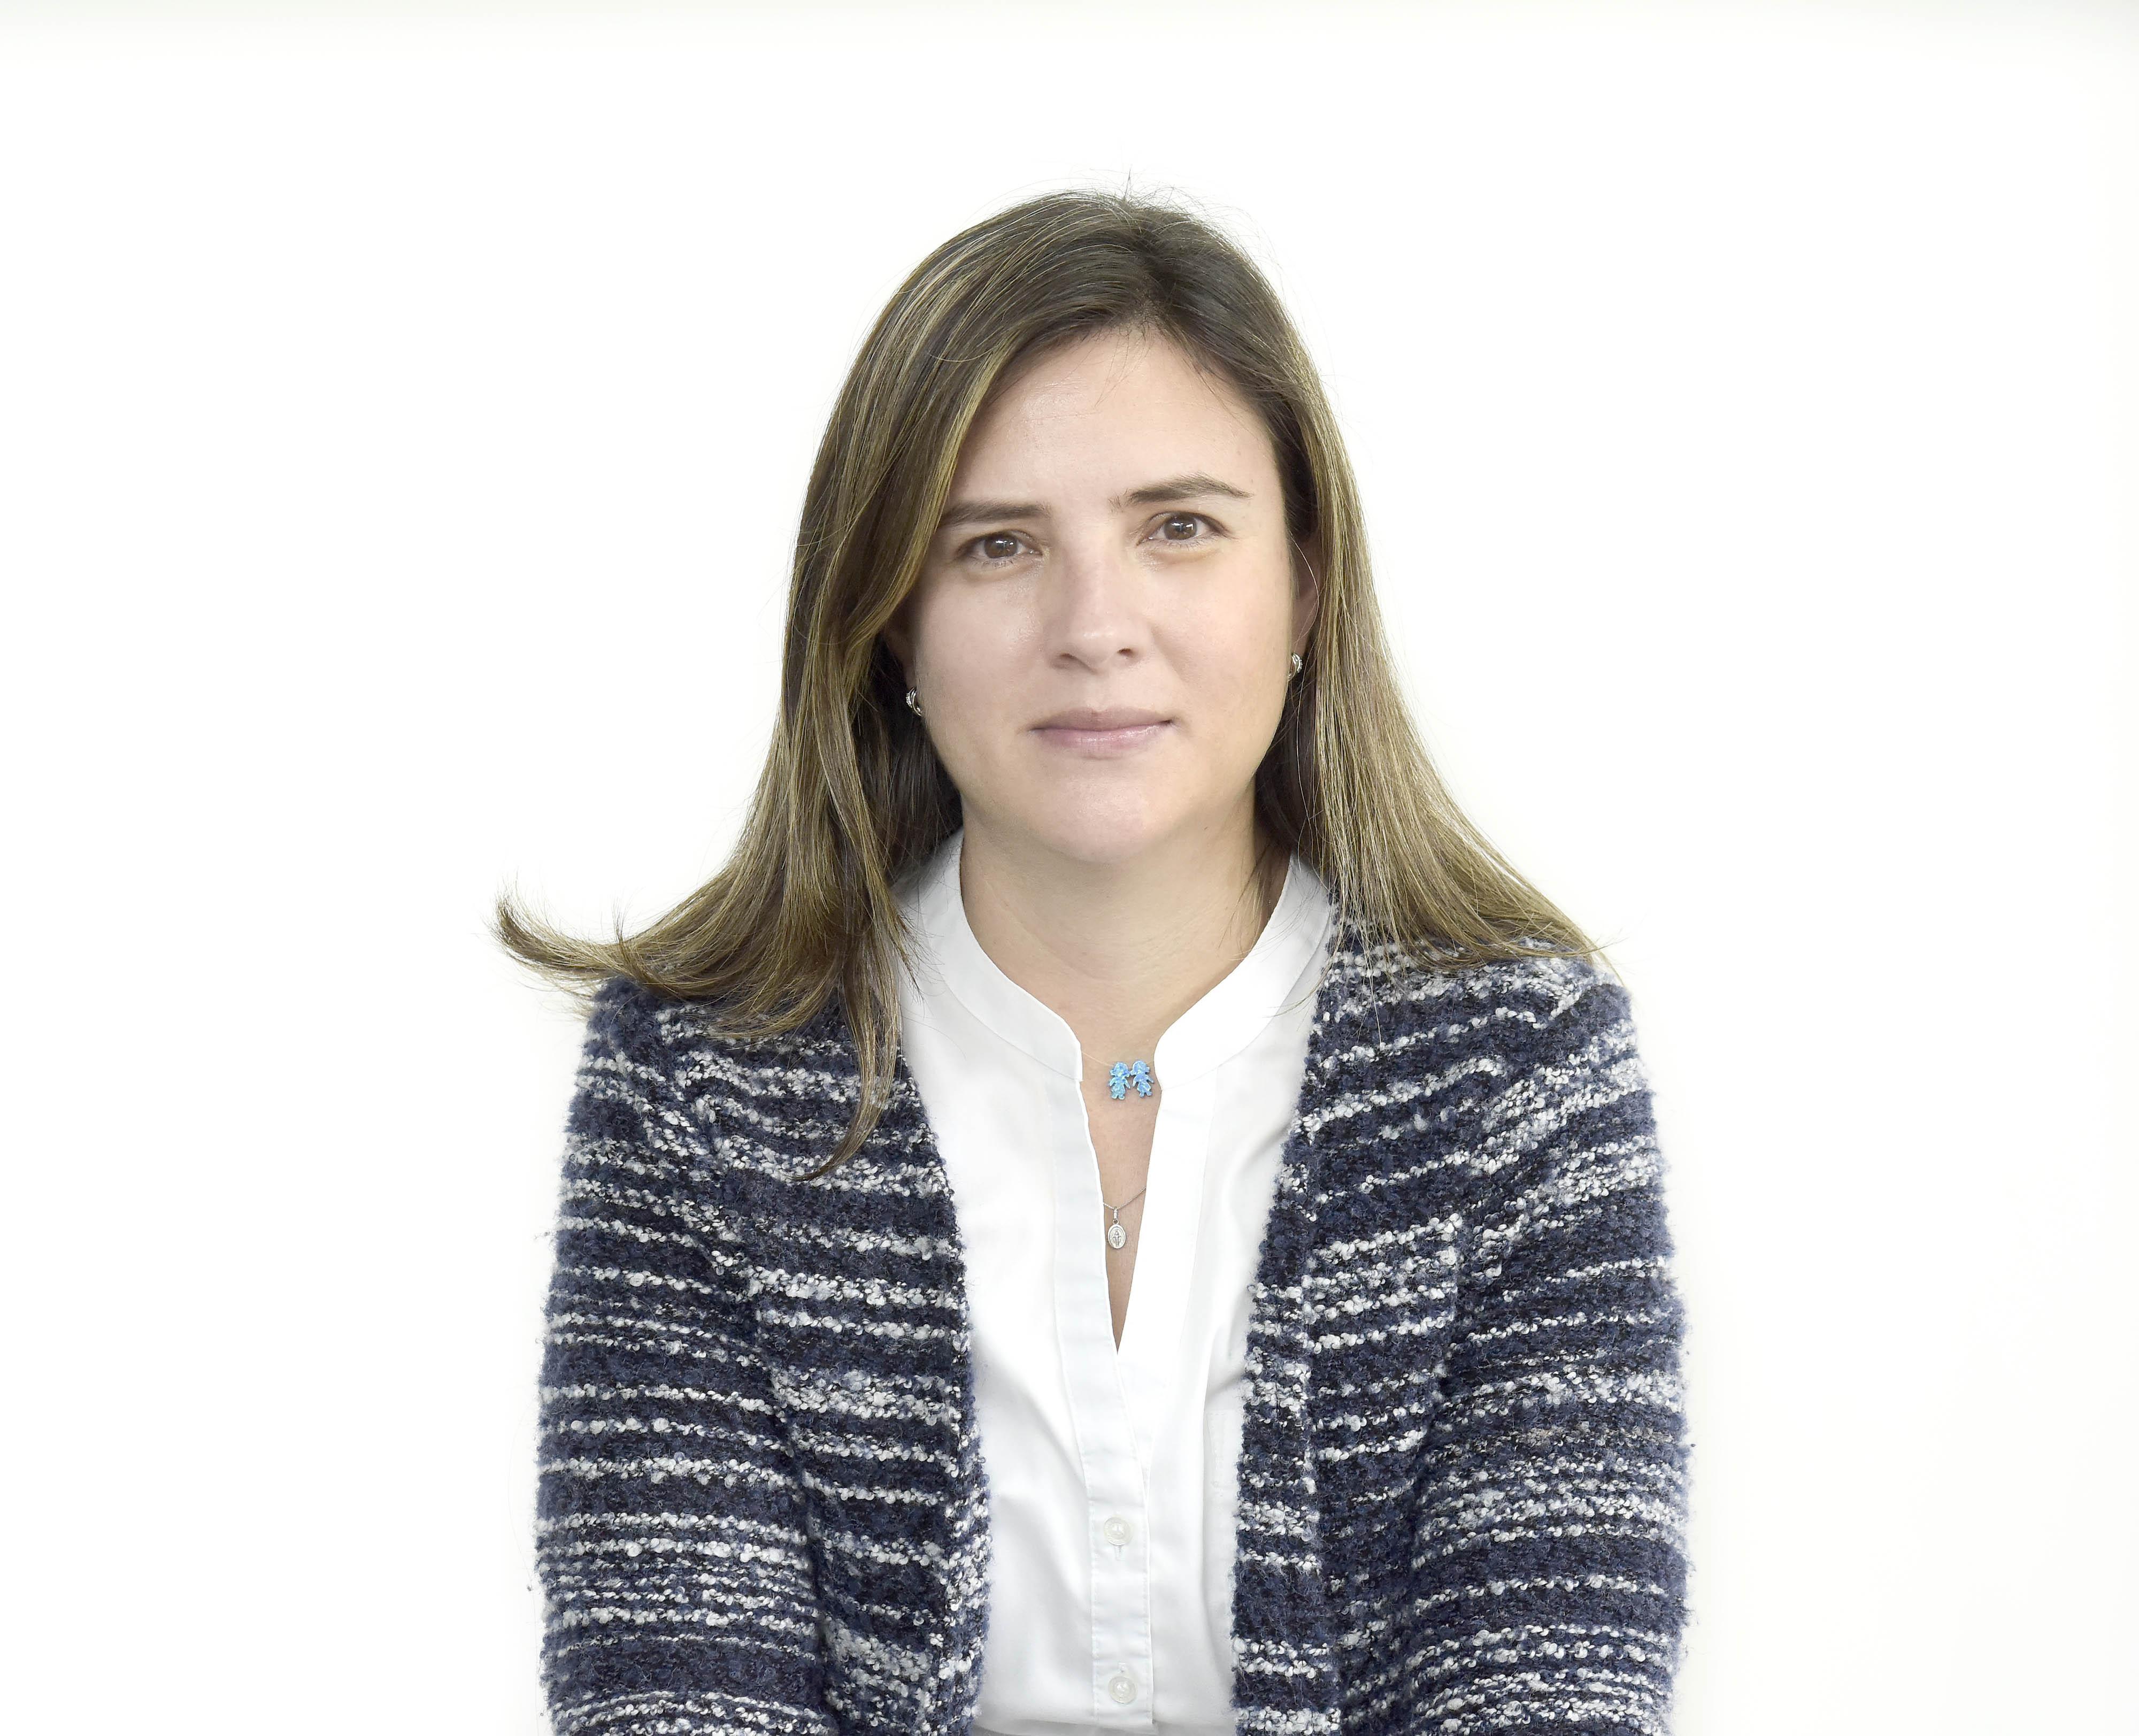 Andrea León López